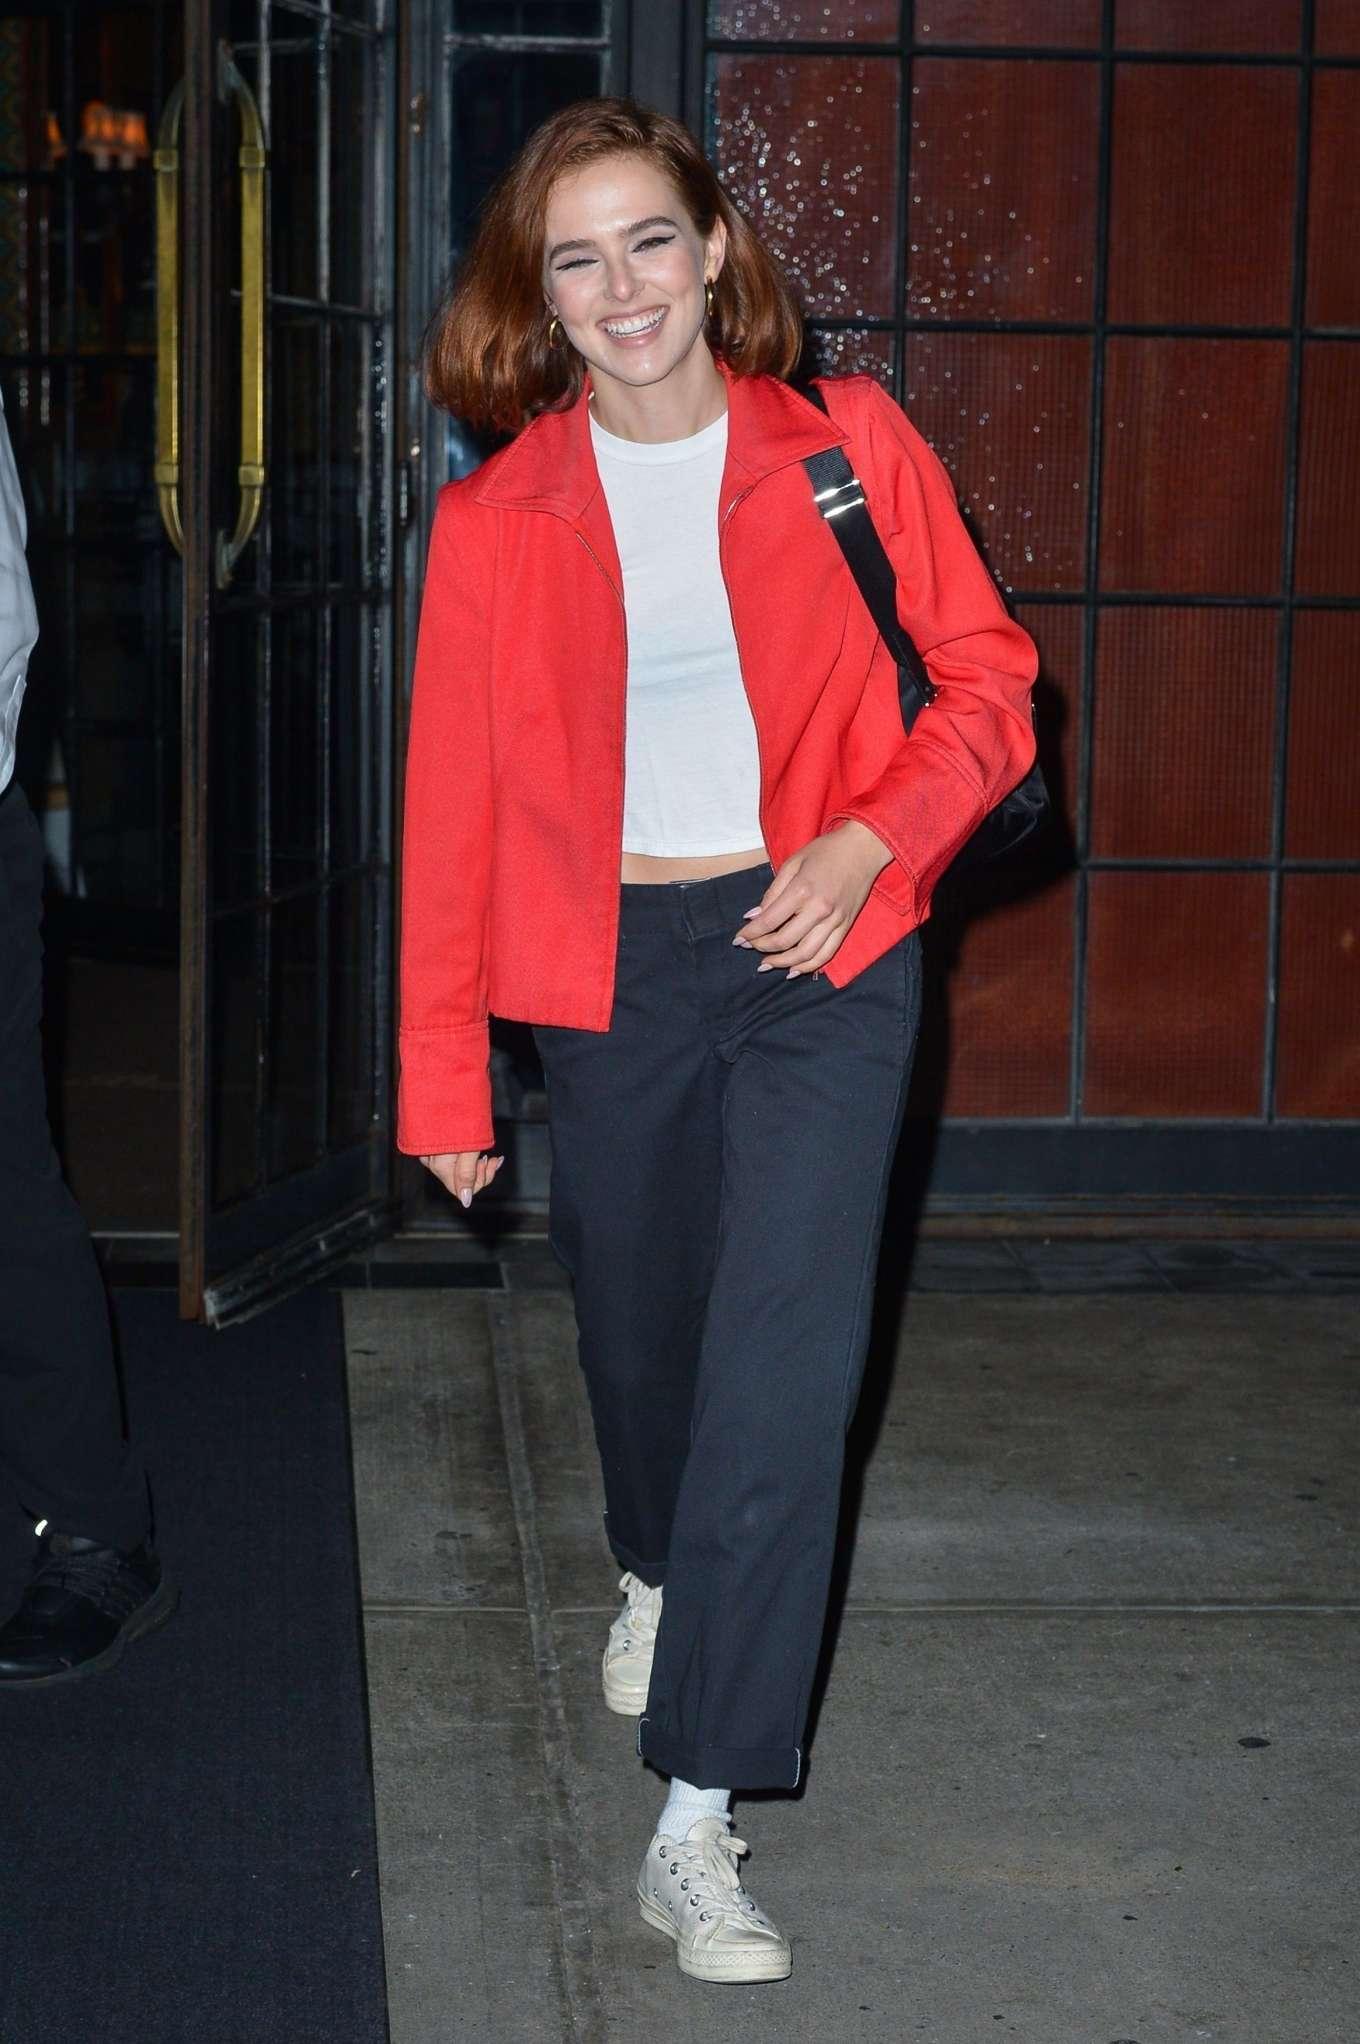 Zoey Deutch - Exits The Bowery Hotel in NY